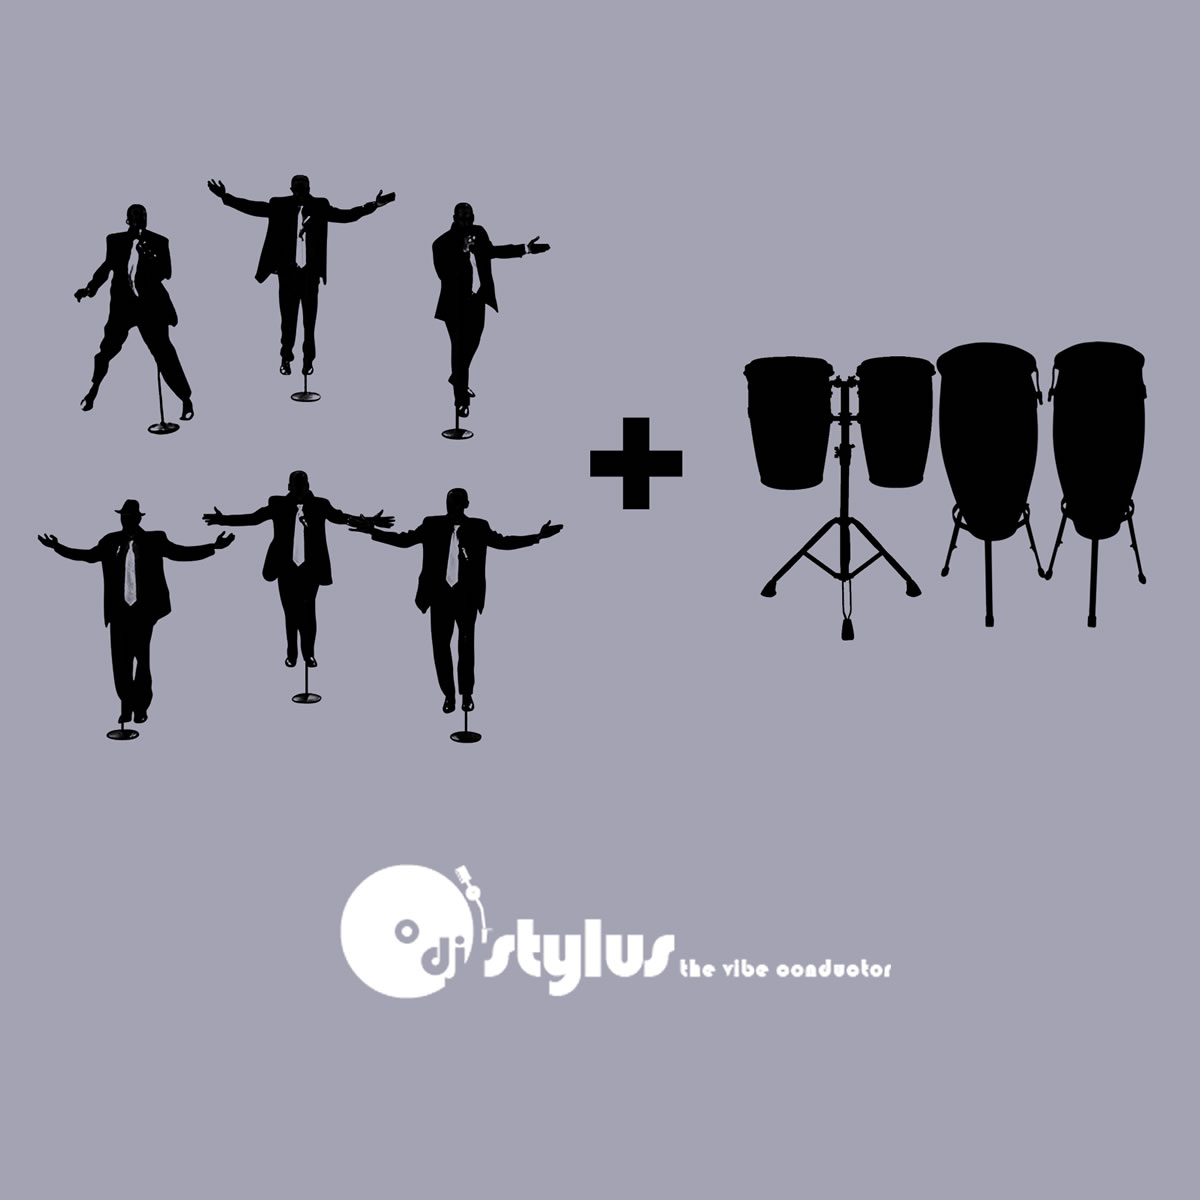 DJ Stylus - The Vibe Conductor - N.E. Crank Break